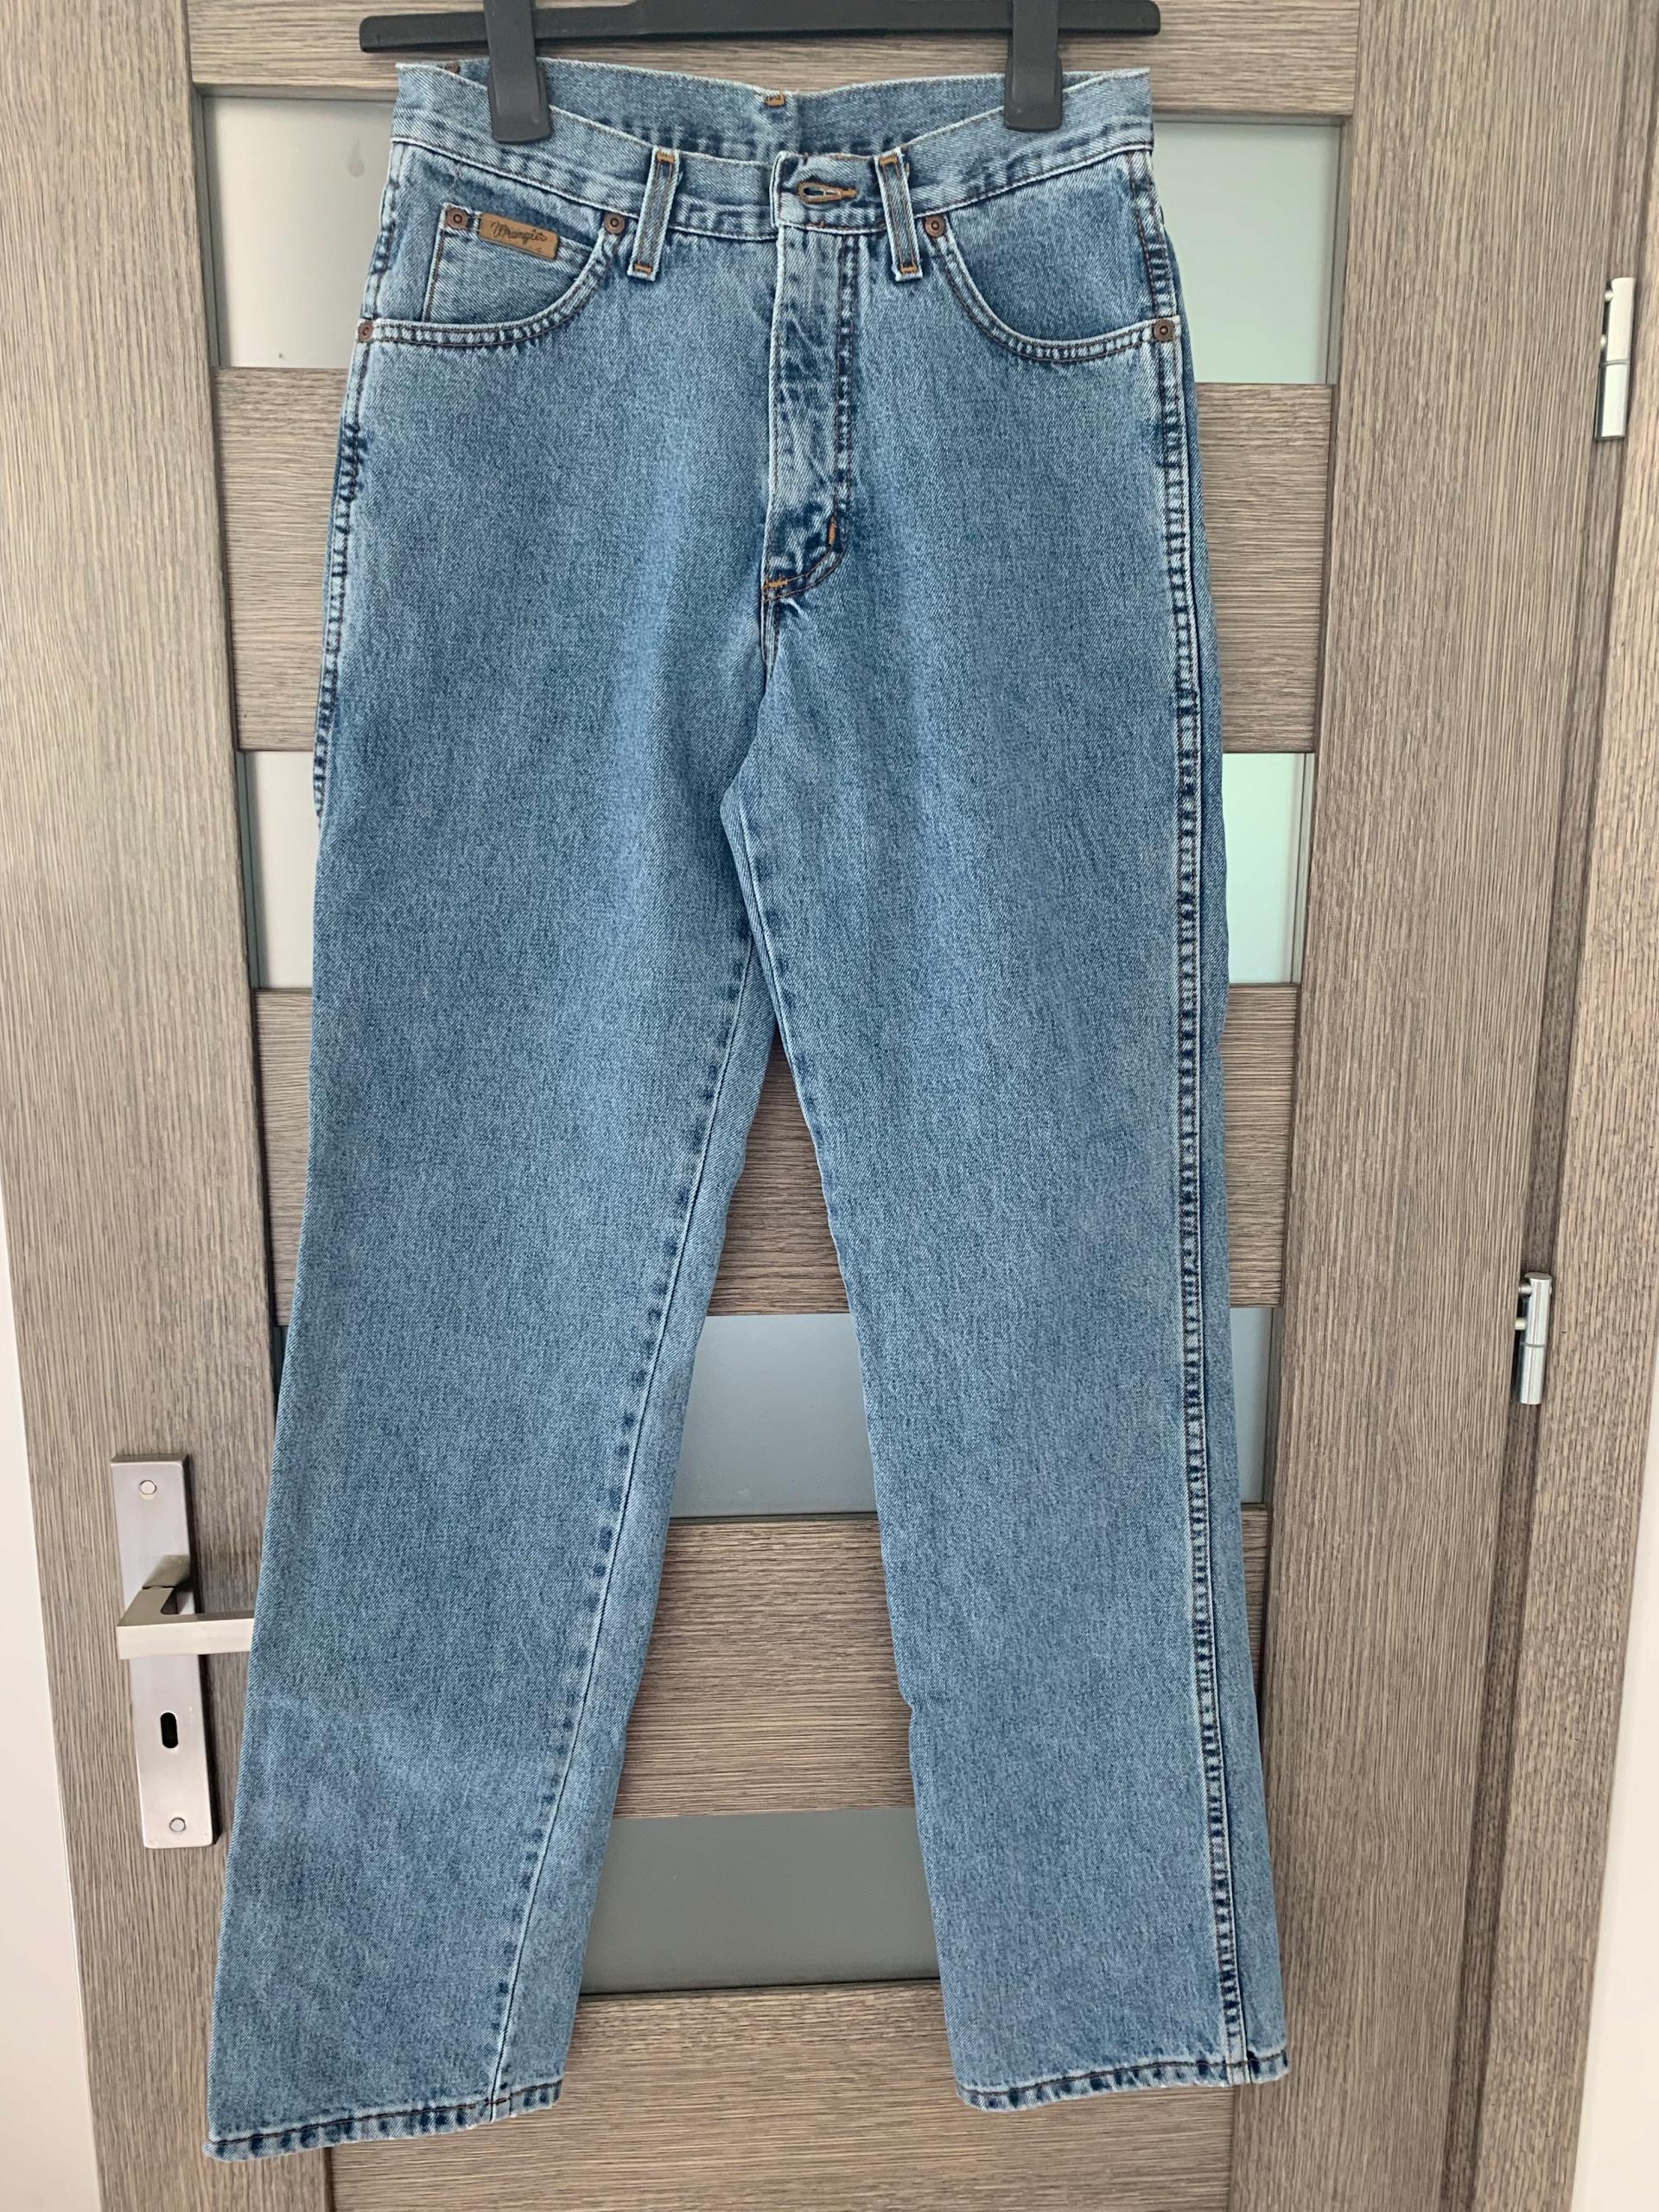 Jeansy wrangler 30/34 uniseks boyfriend mom jeans